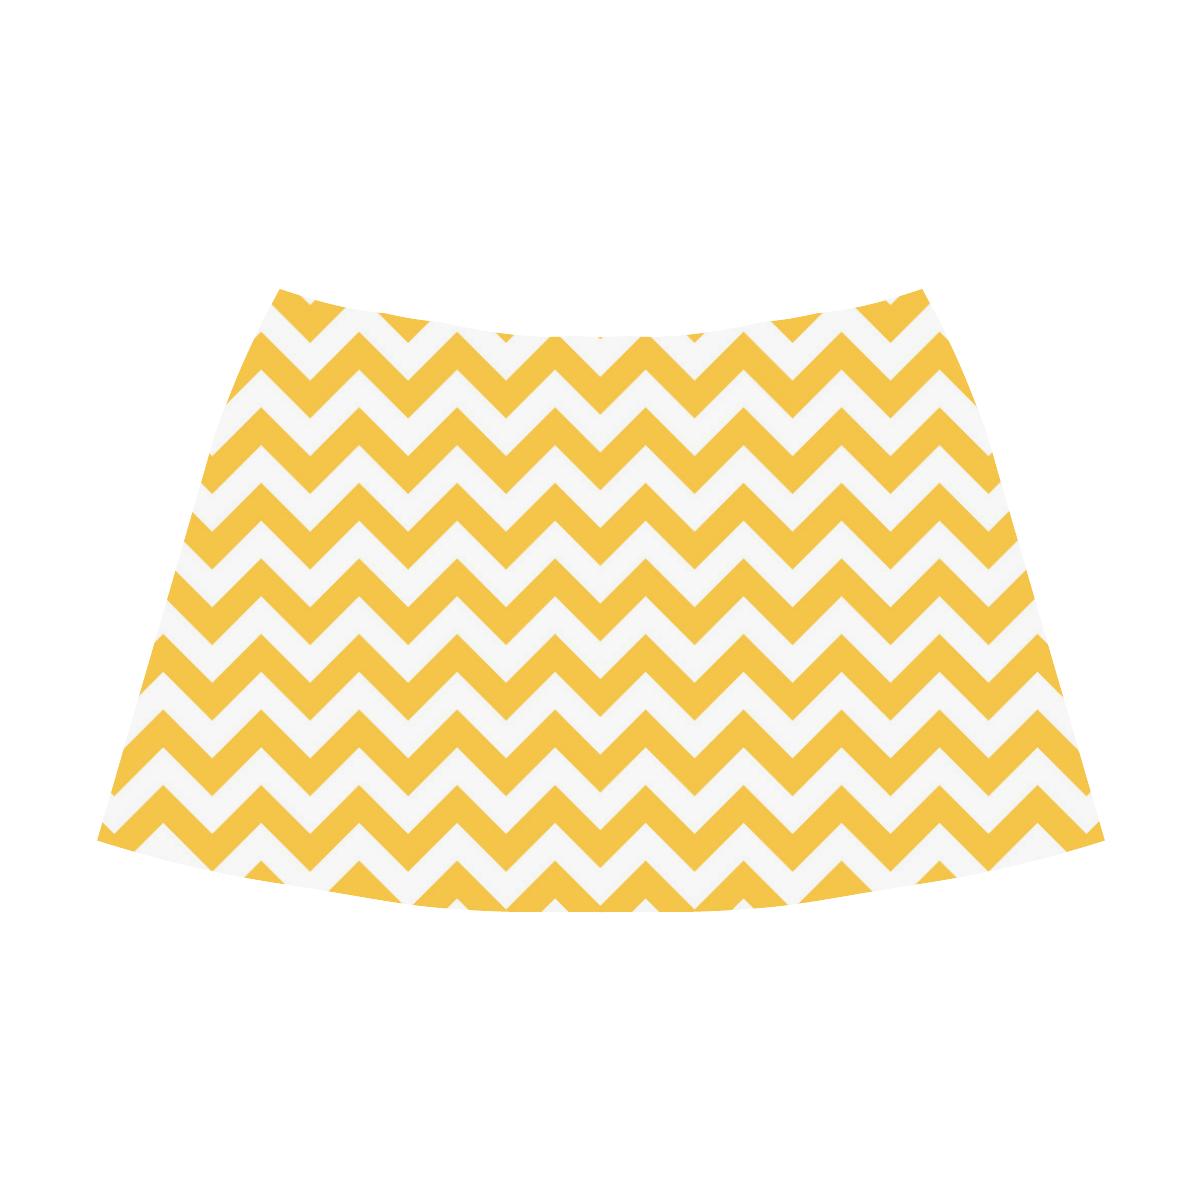 Sunny Yellow zigzag chevron pattern Mnemosyne Women's Crepe Skirt (Model D16)